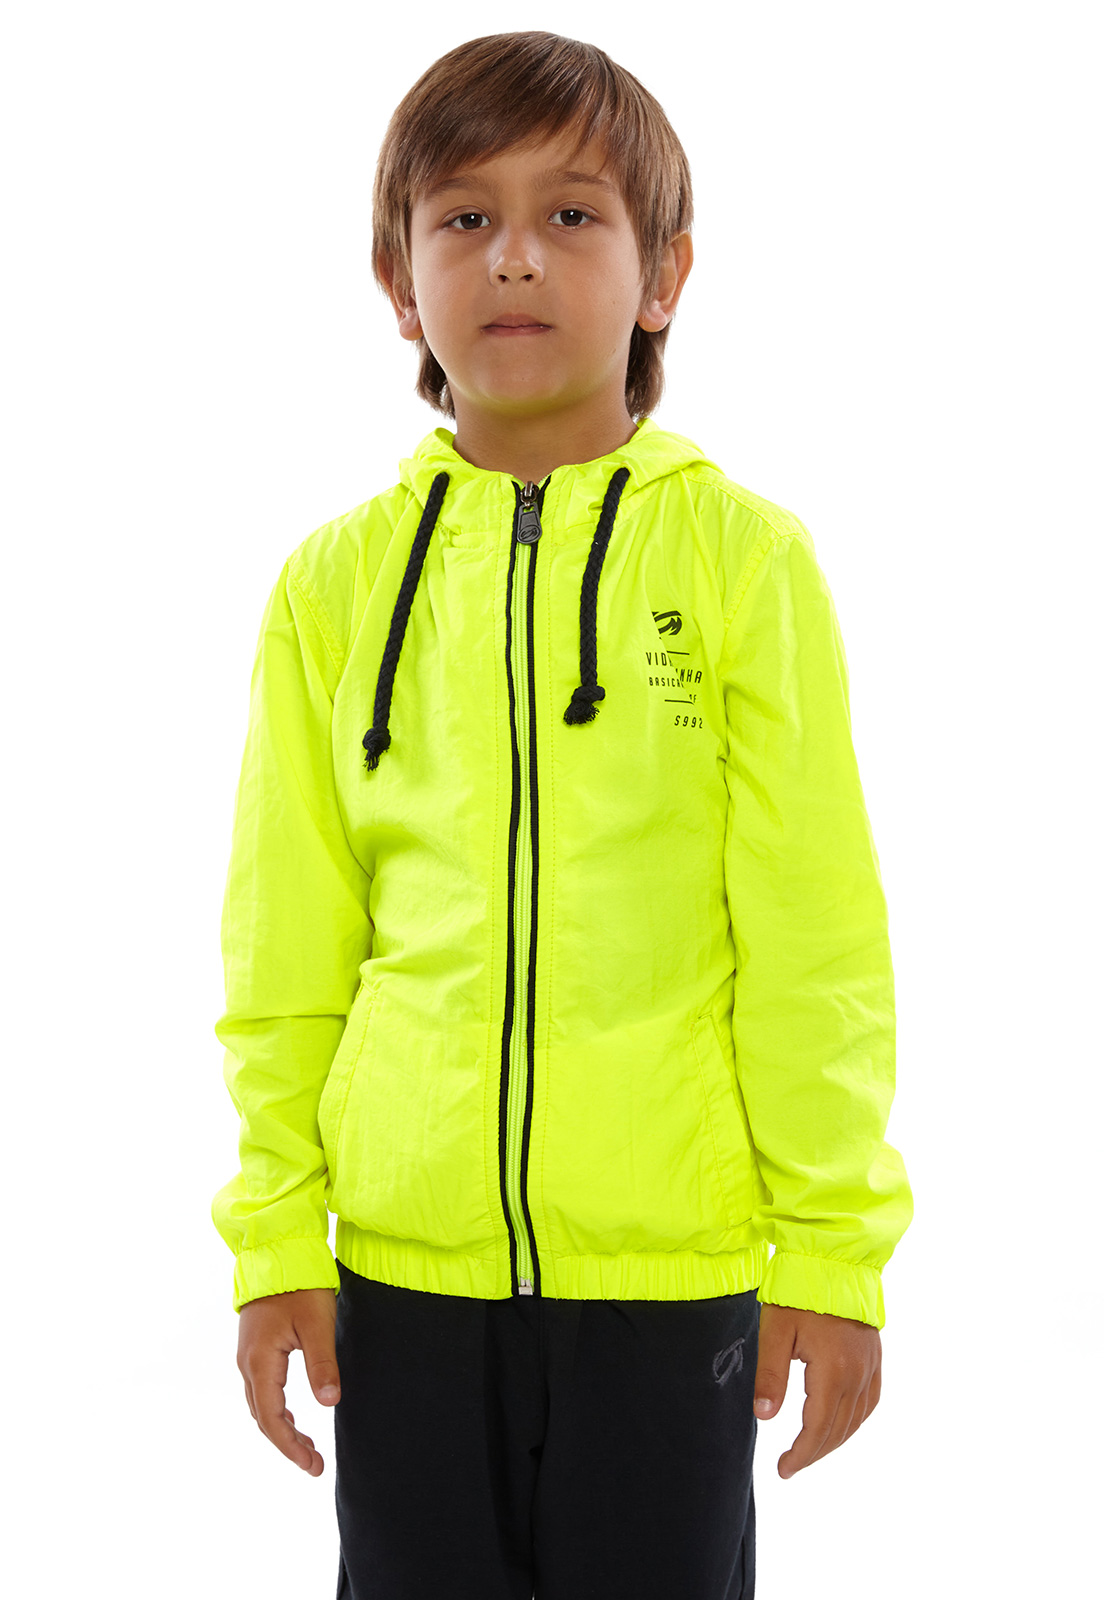 Jaqueta Corta Vento Infantil Vida Marinha Neon com Capuz